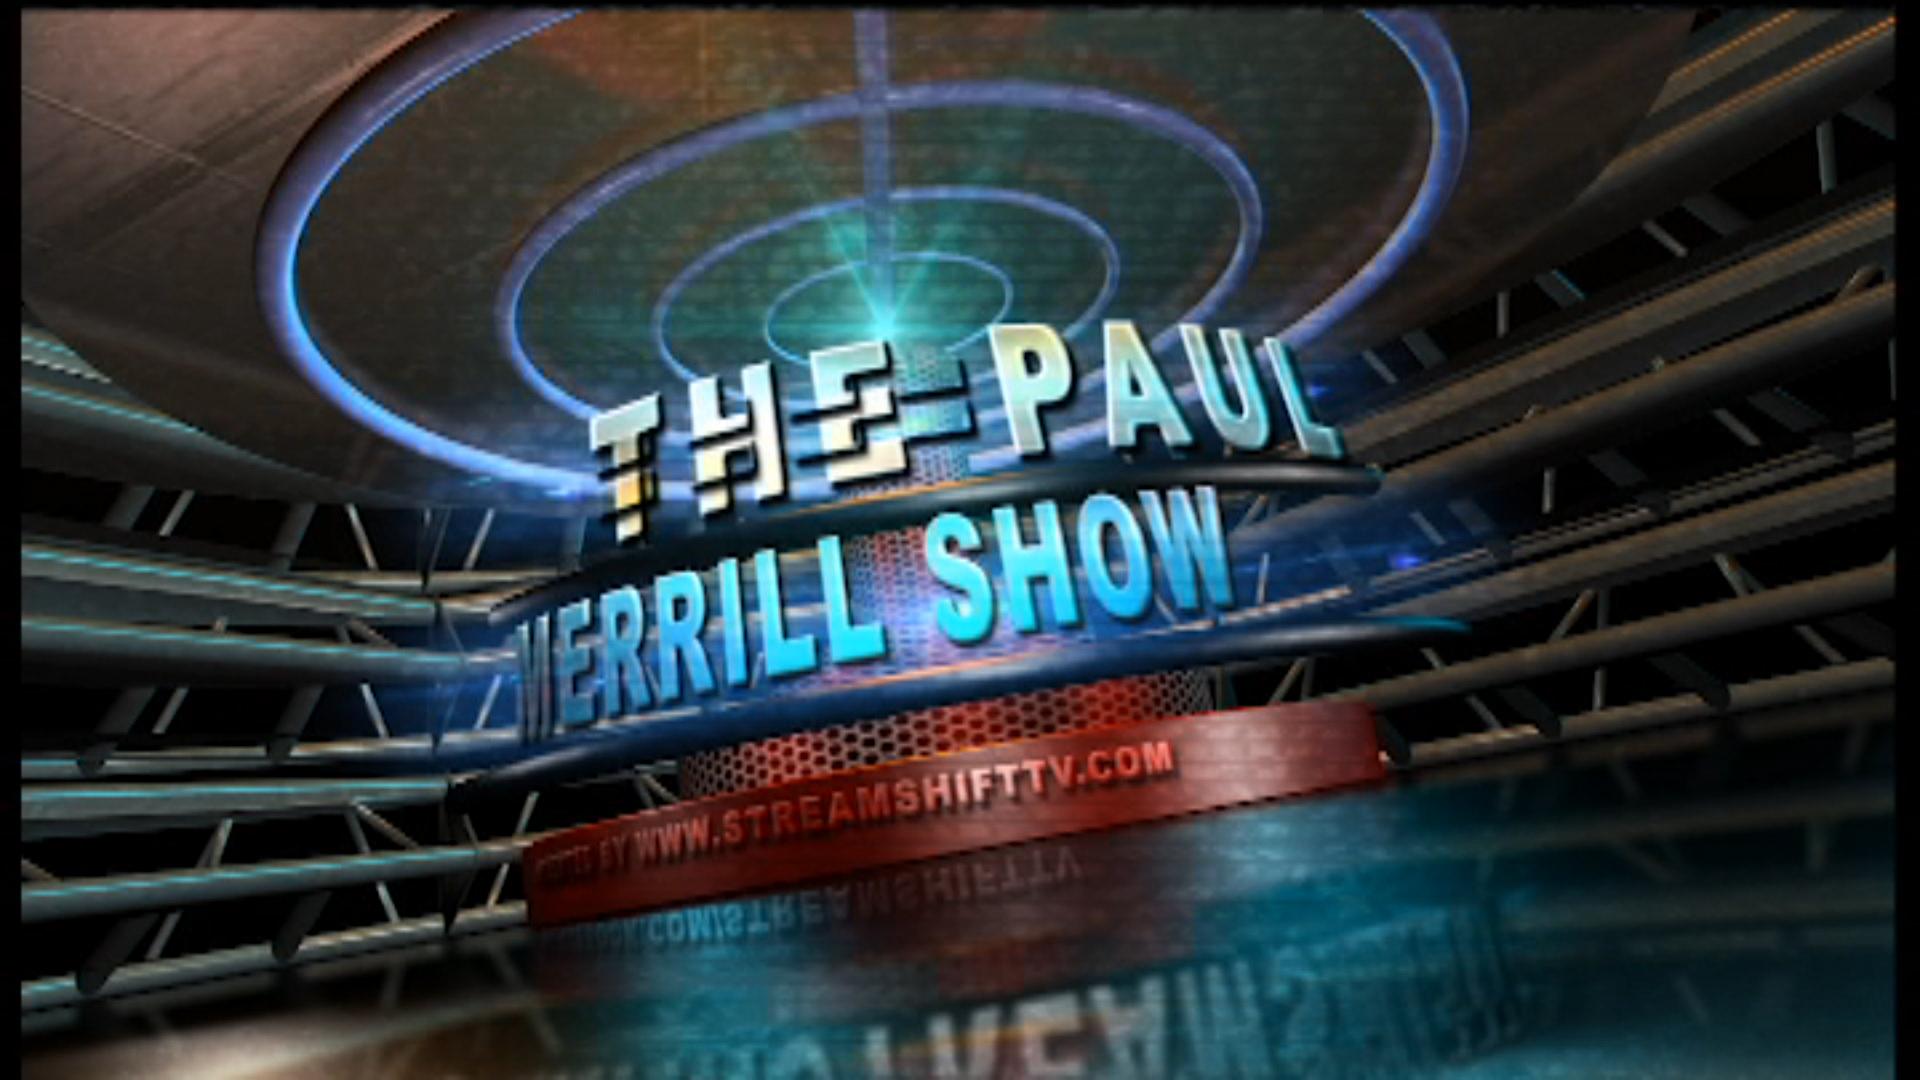 The Paul Merrill Show - July 31st, 2019